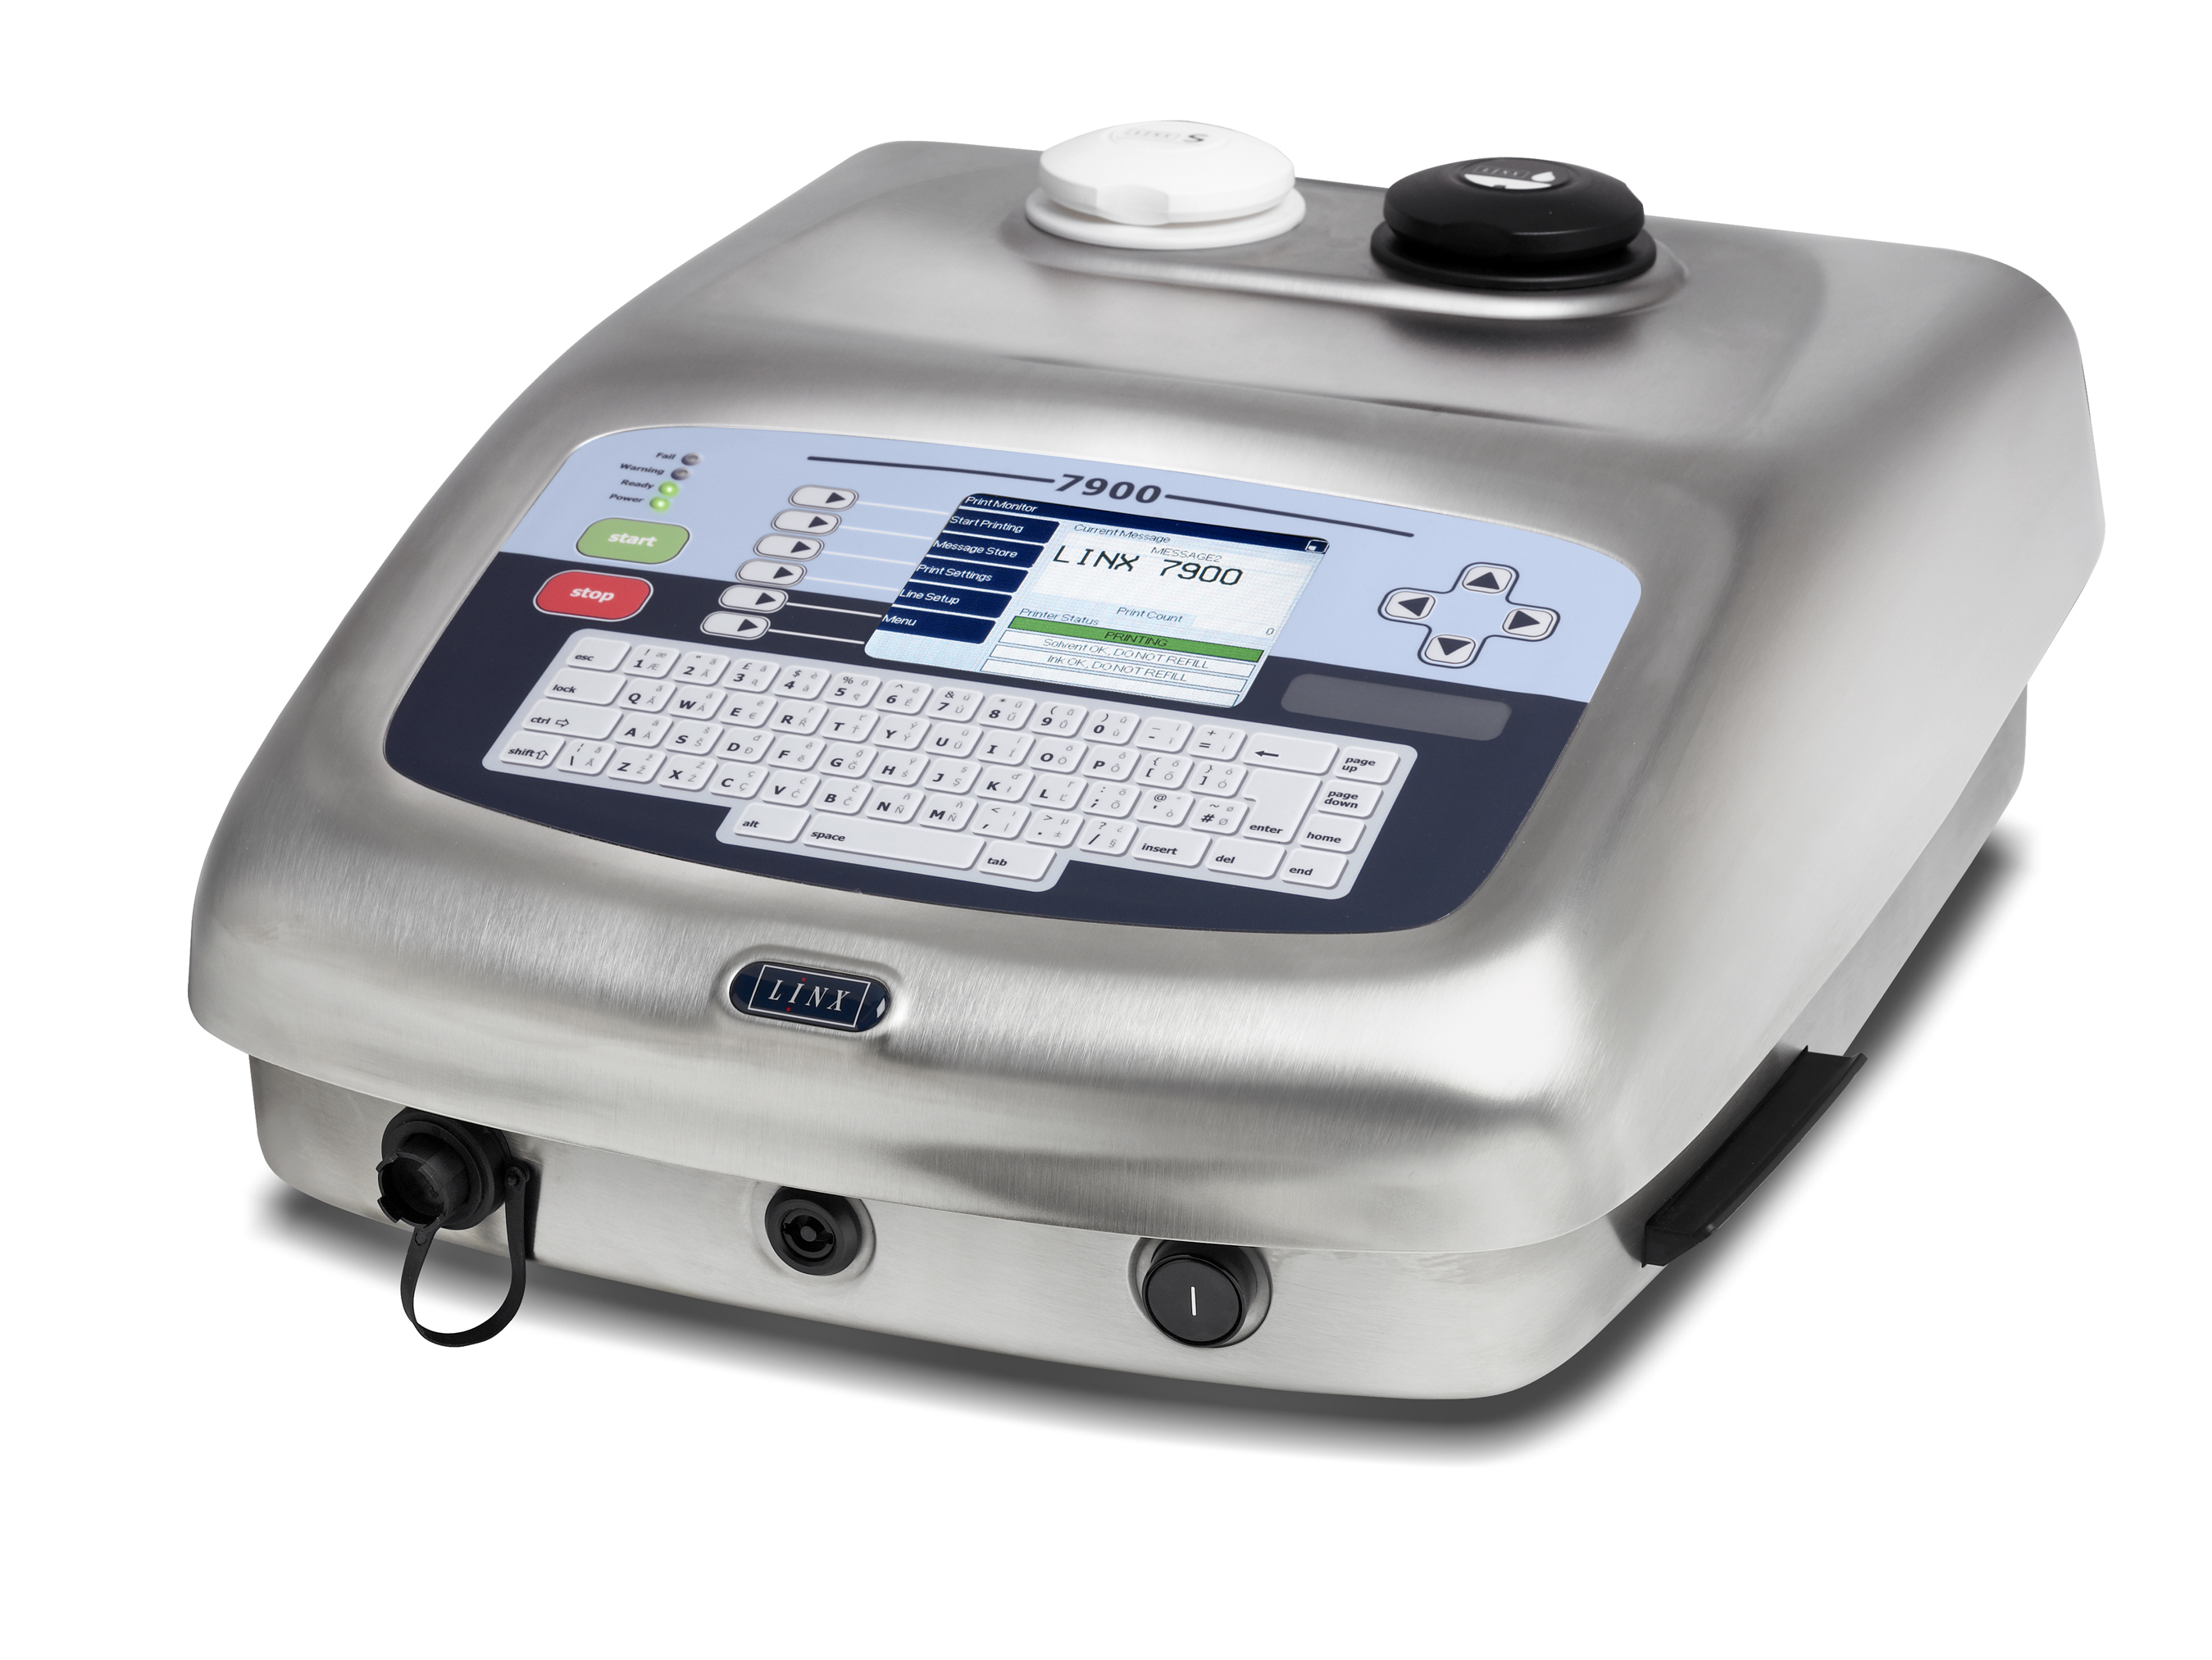 IJPN Technologies to Launch Laser Printers SL1